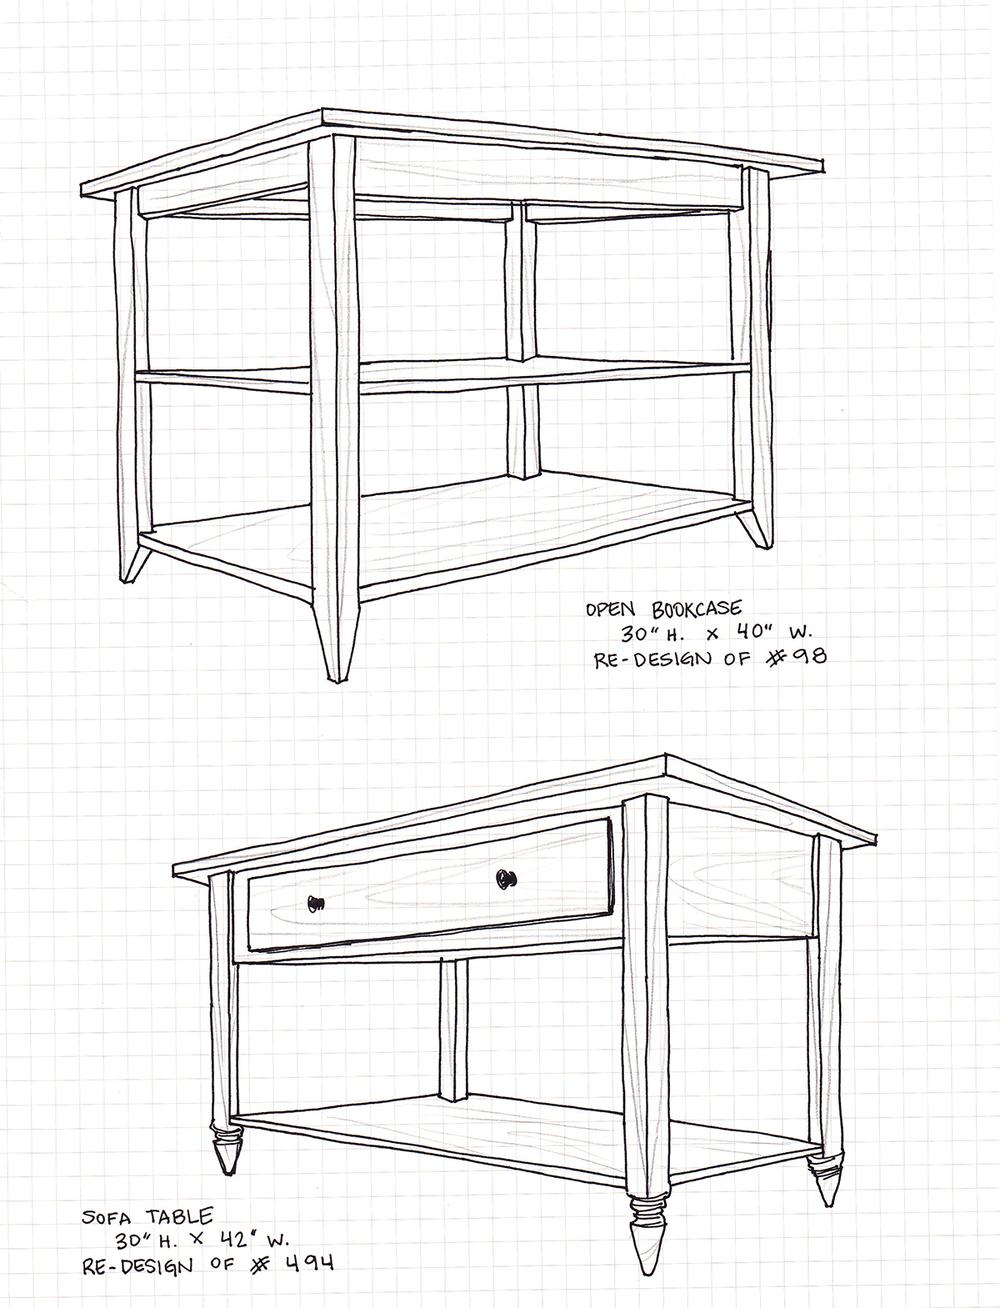 Bookcase & Sofa Table